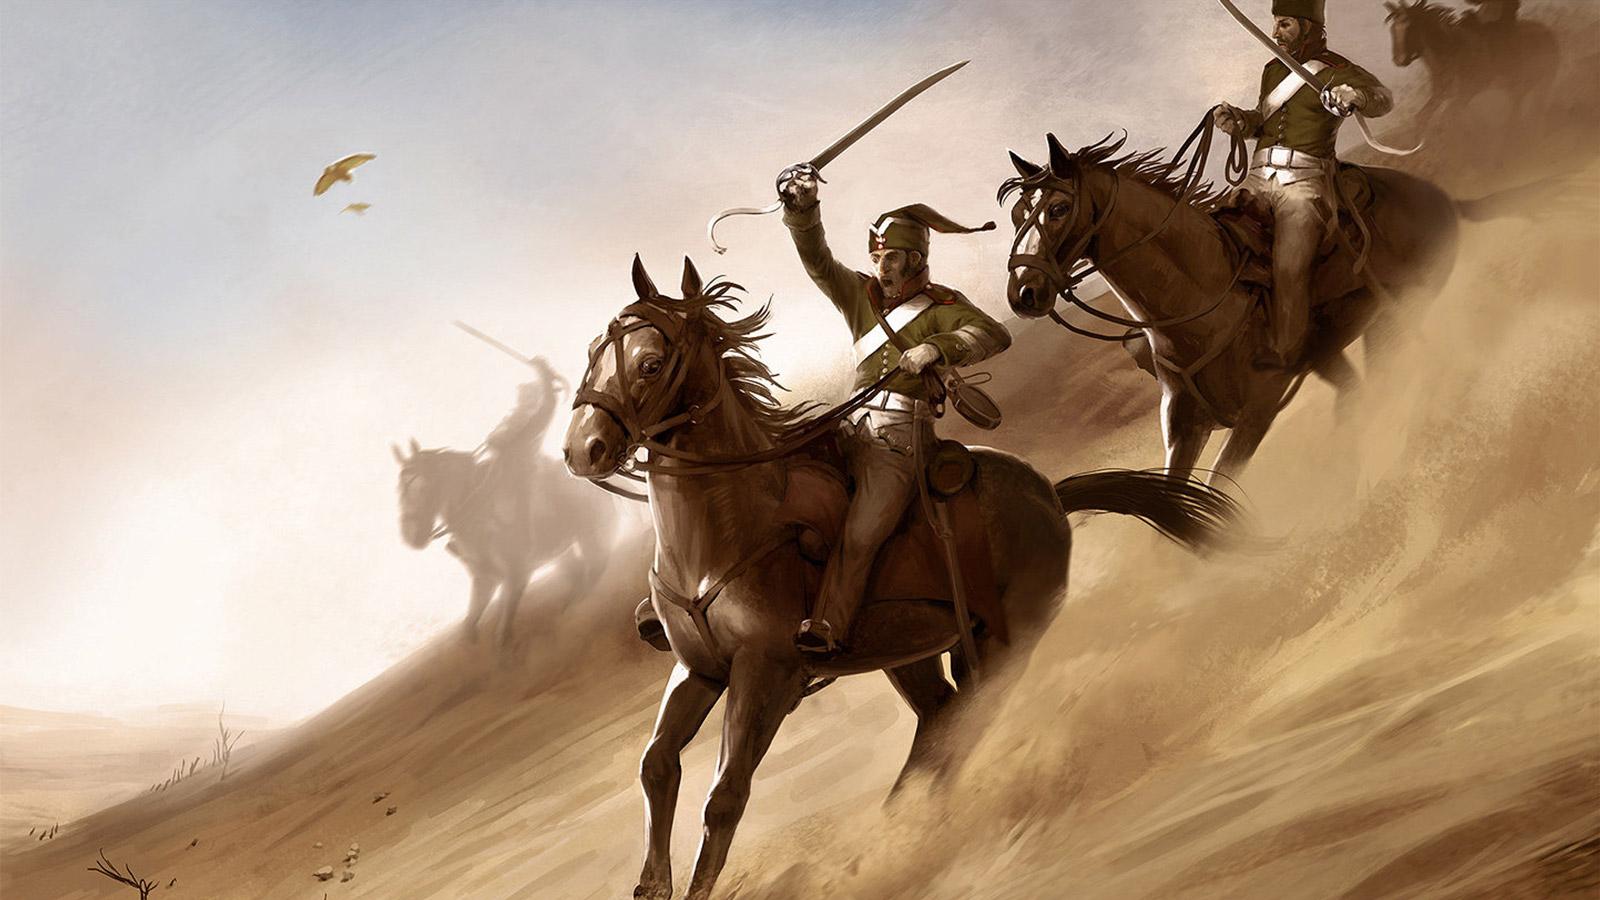 Free Napoleon: Total War Wallpaper in 1600x900